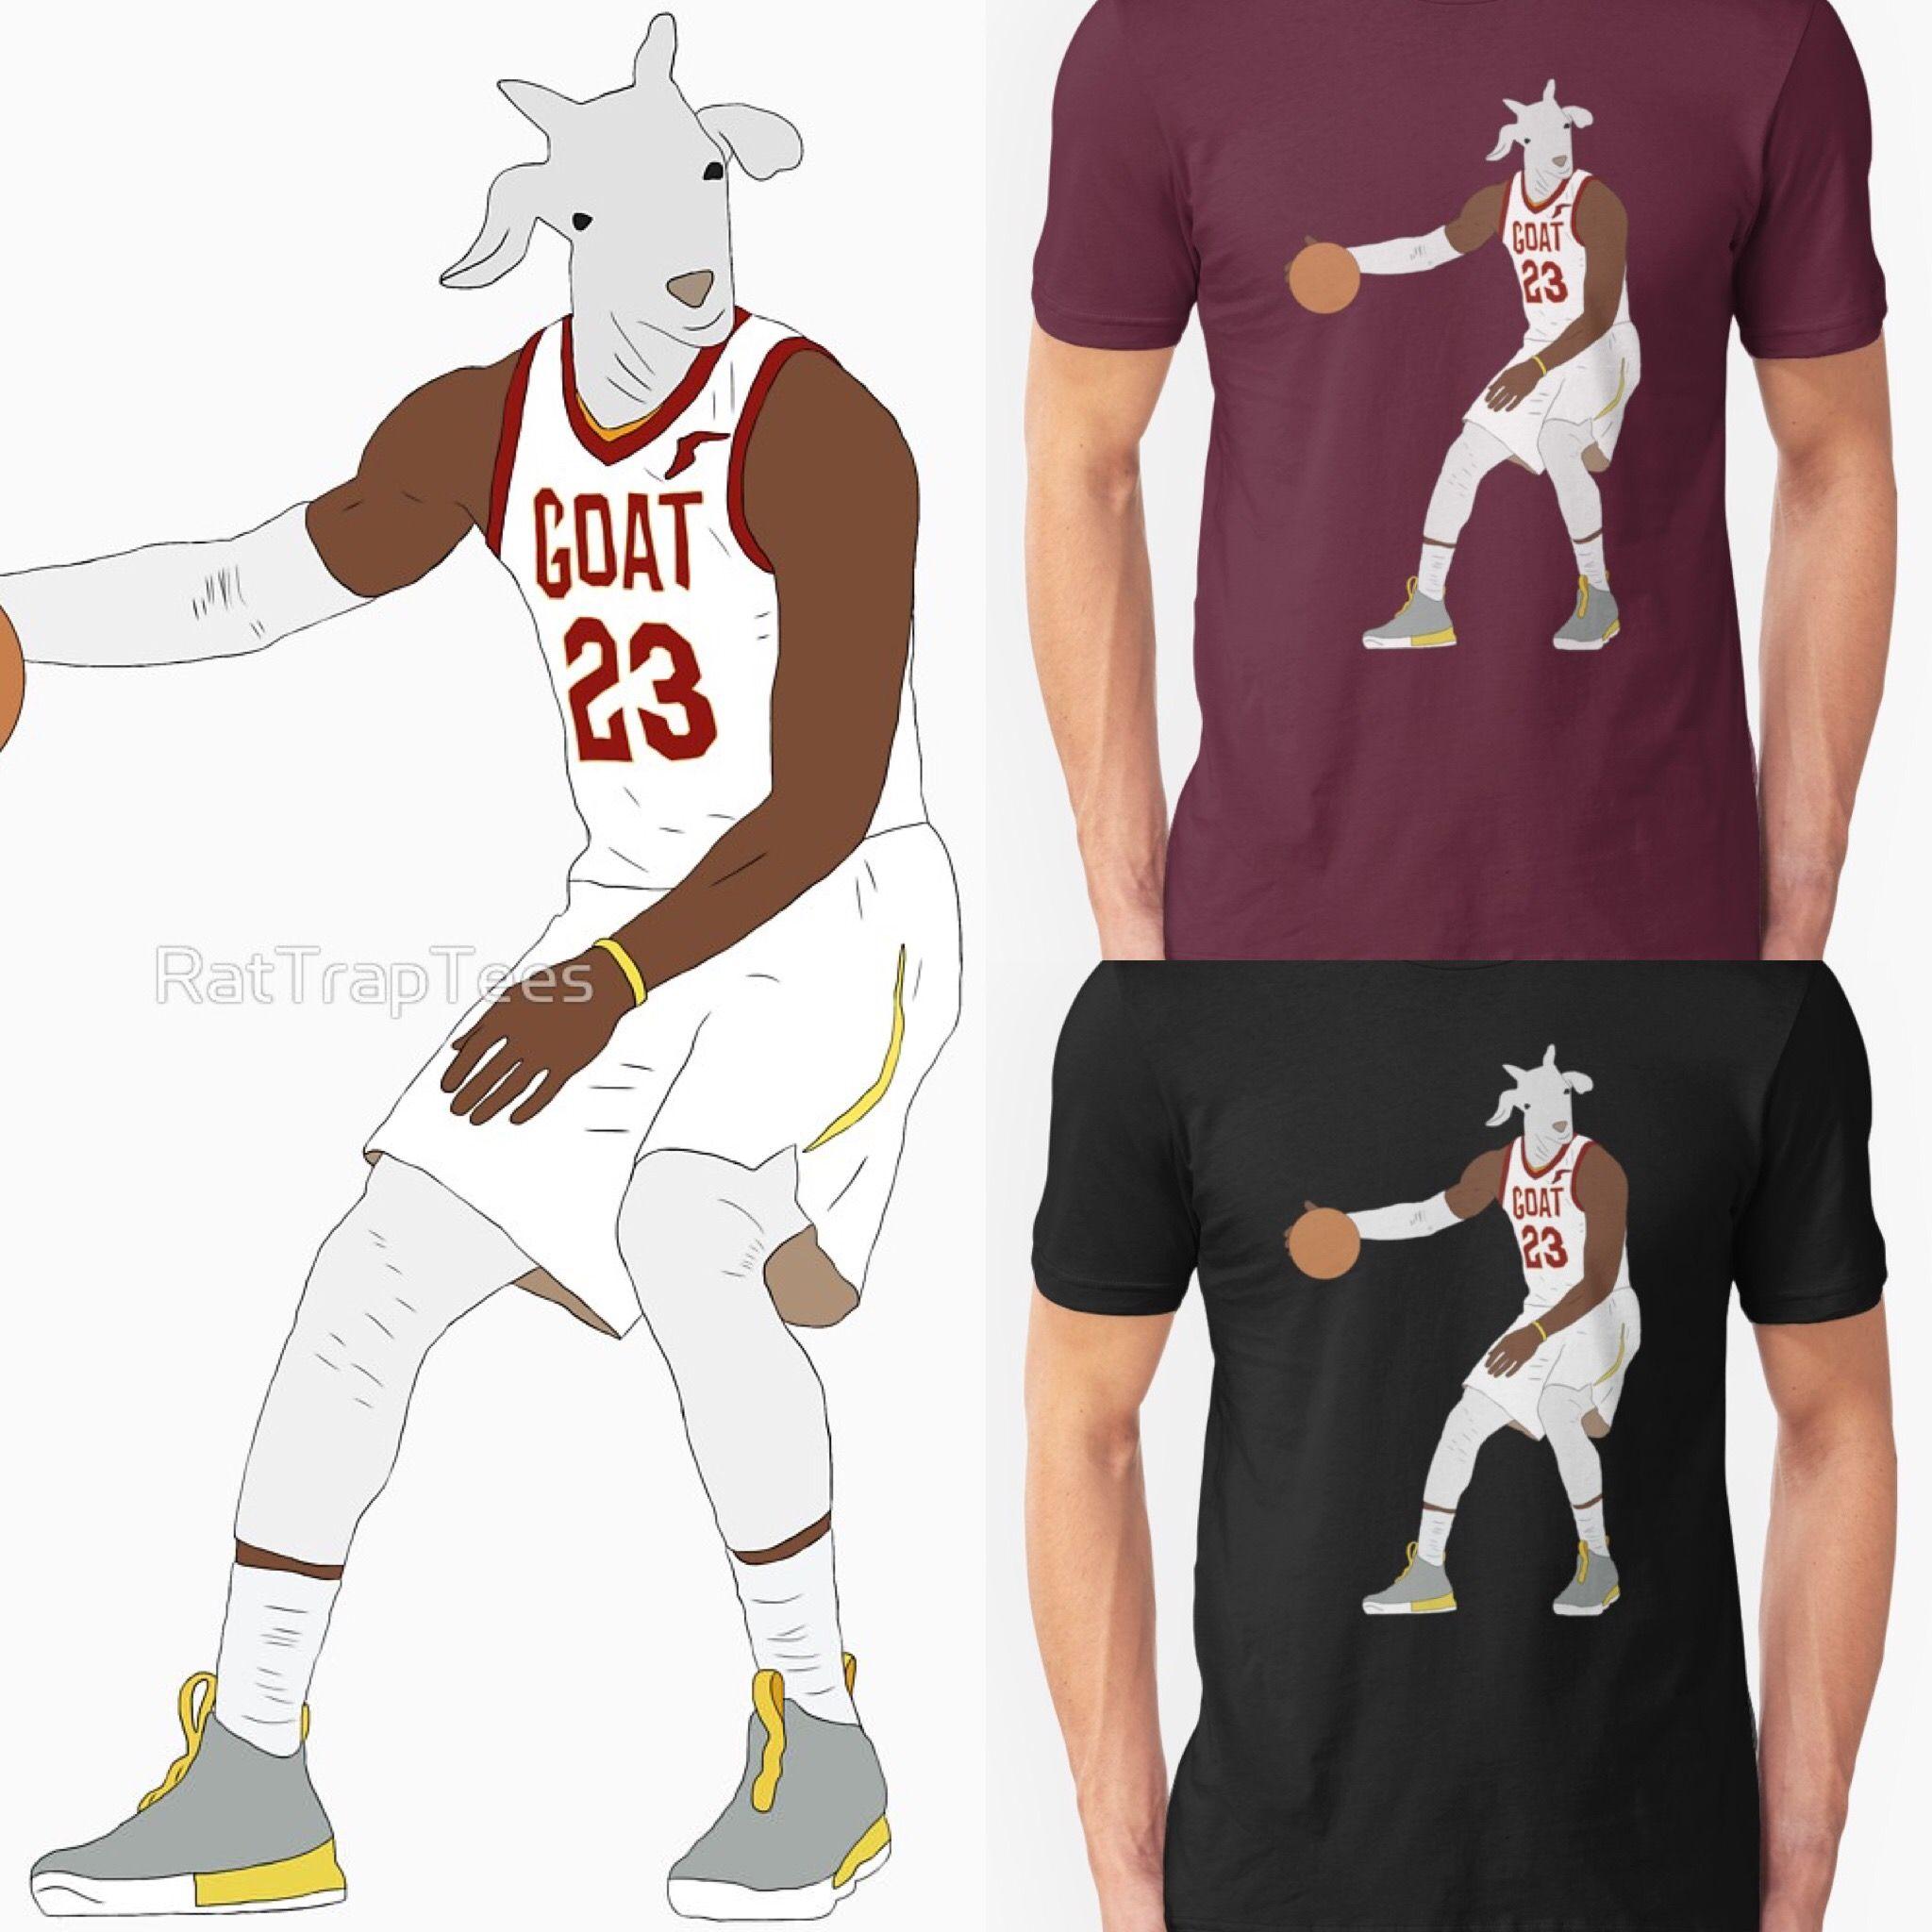 outlet store 4753d 83024 LeBron James GOAT Shirt | NBA T-Shirts | Nba t shirts ...